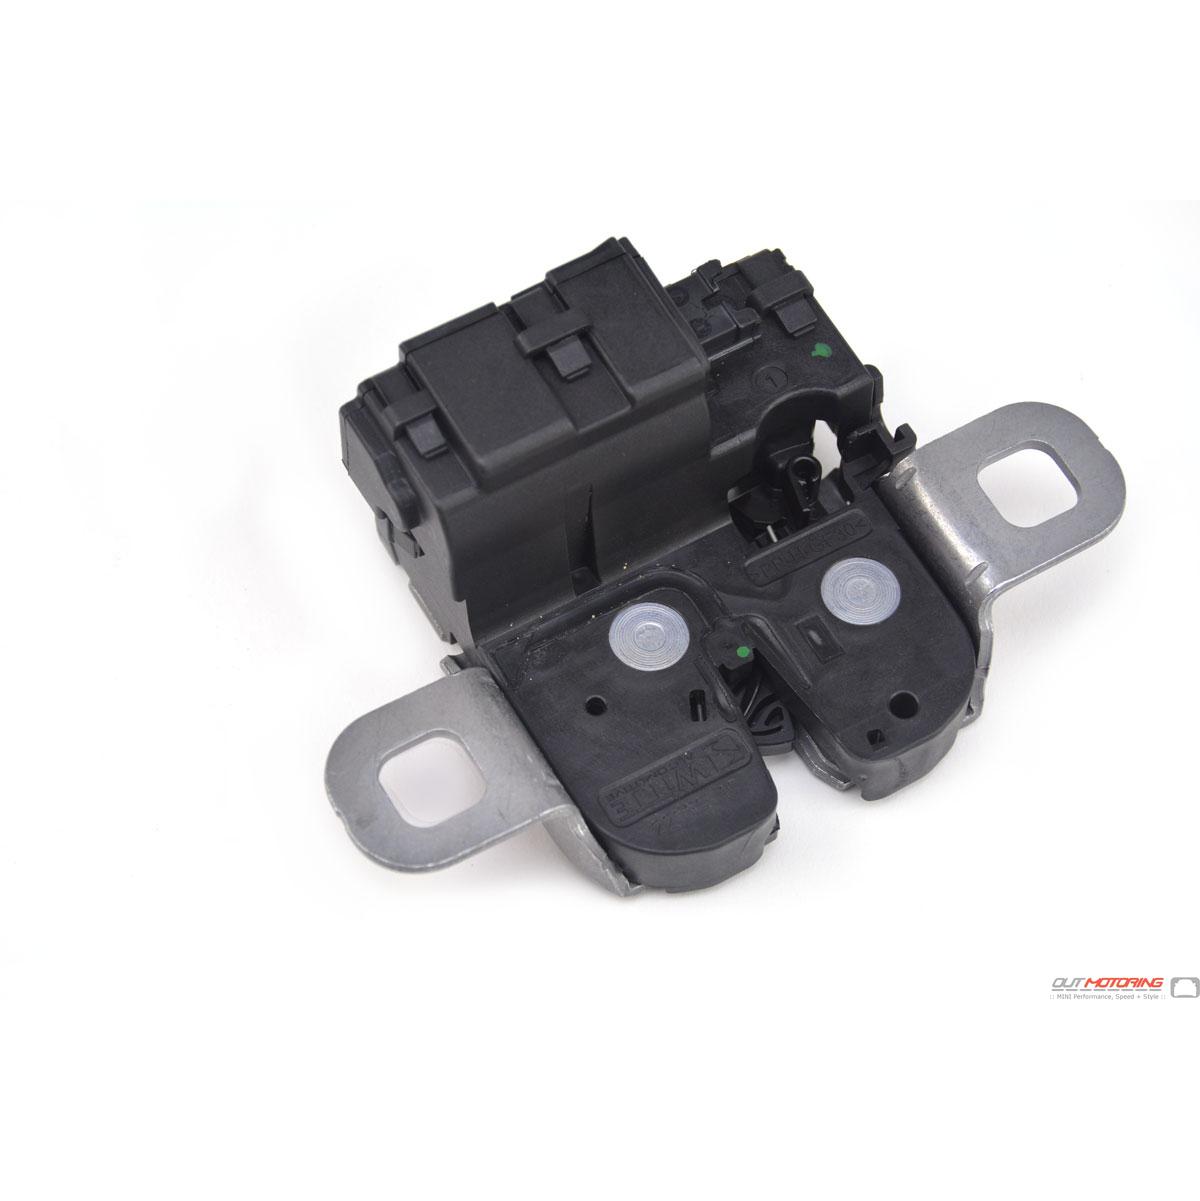 51249802312 MINI Cooper Replacement Trunk Lid Lock